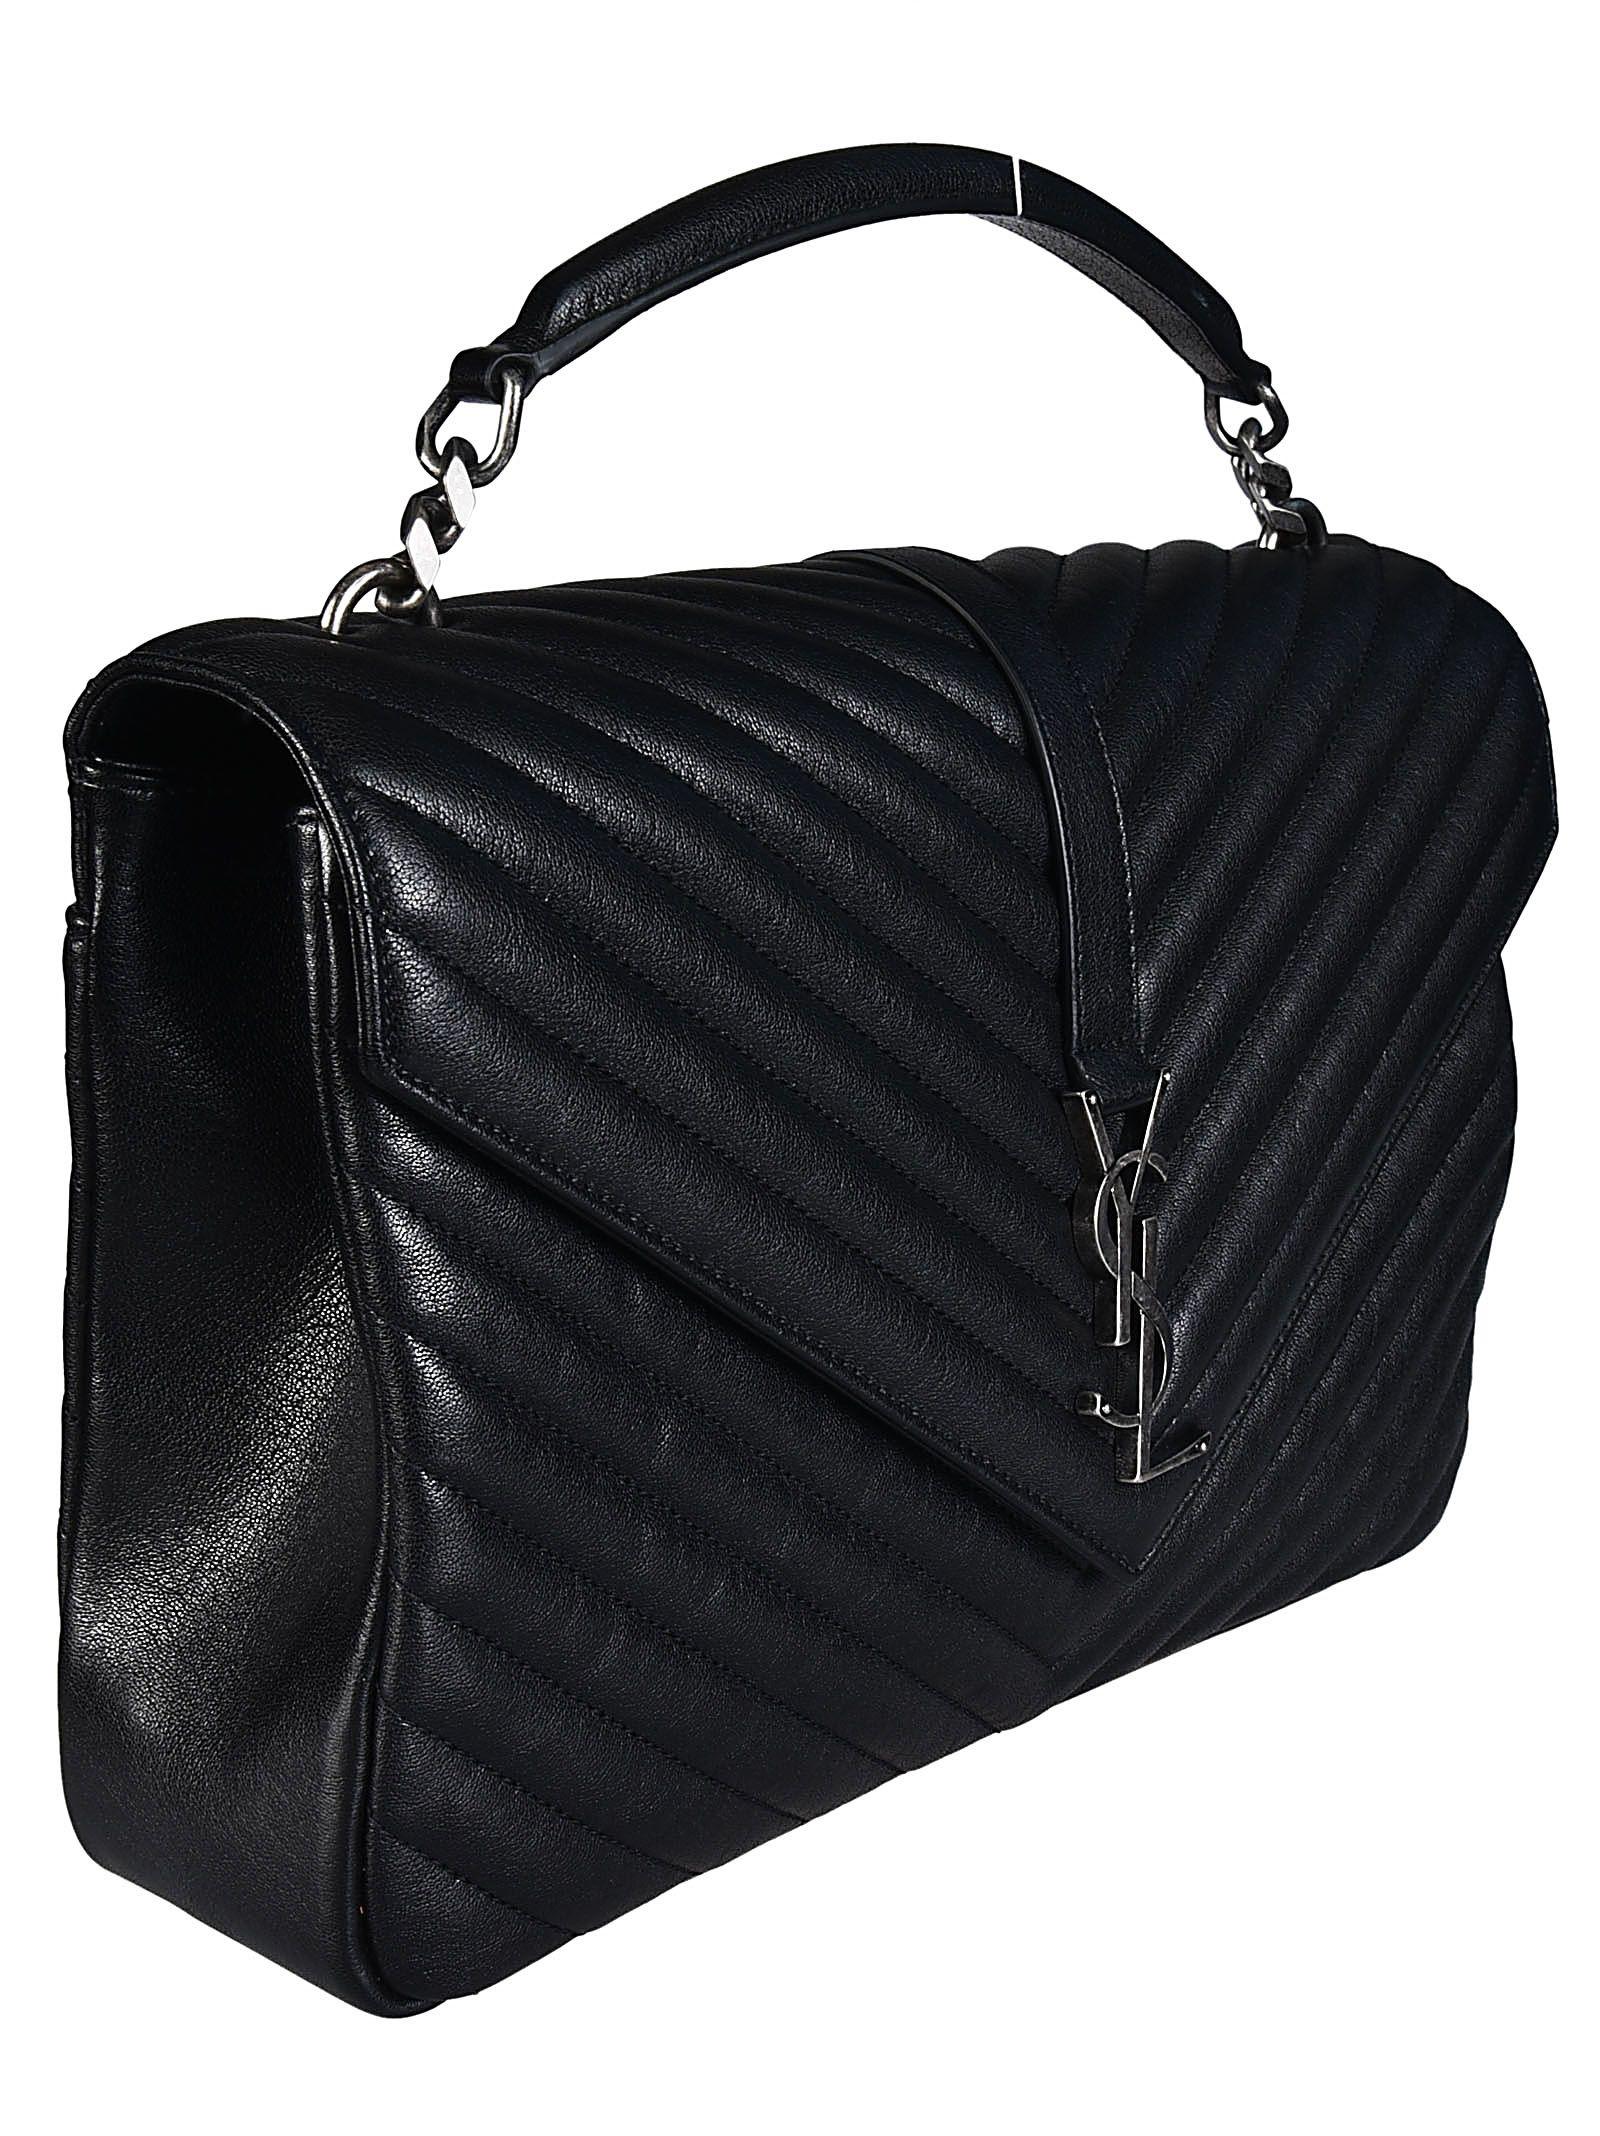 c2a0b84bbd Saint Laurent Saint Laurent Medium College Monogram Shoulder Bag ...